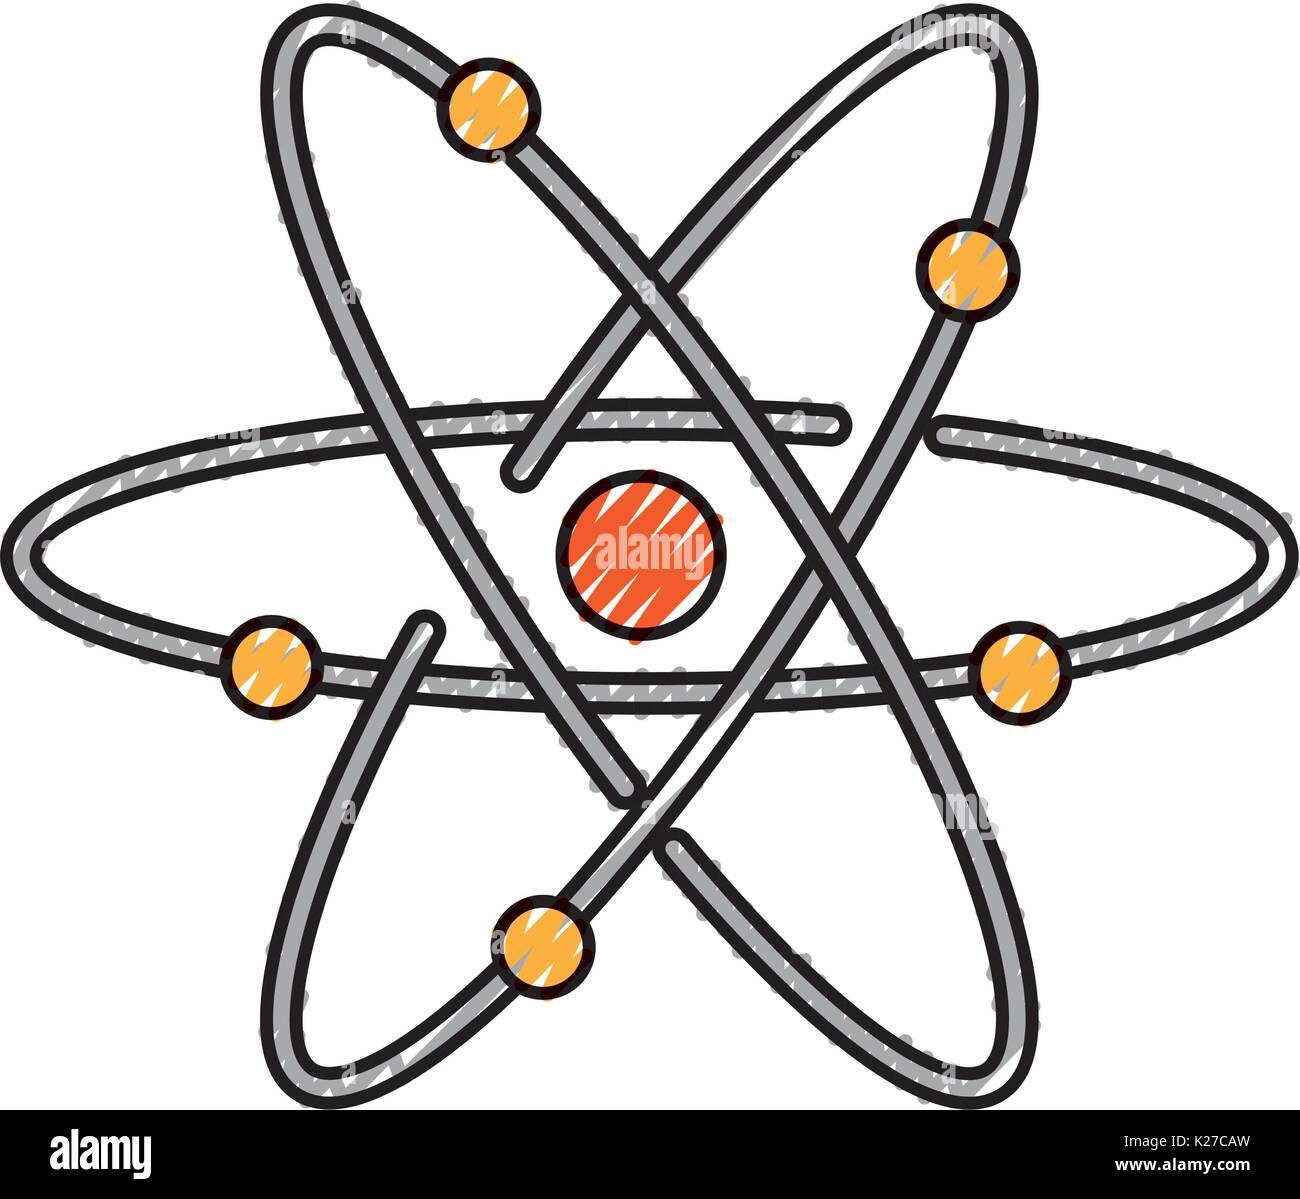 atom molecule isolated icon Stock Vector